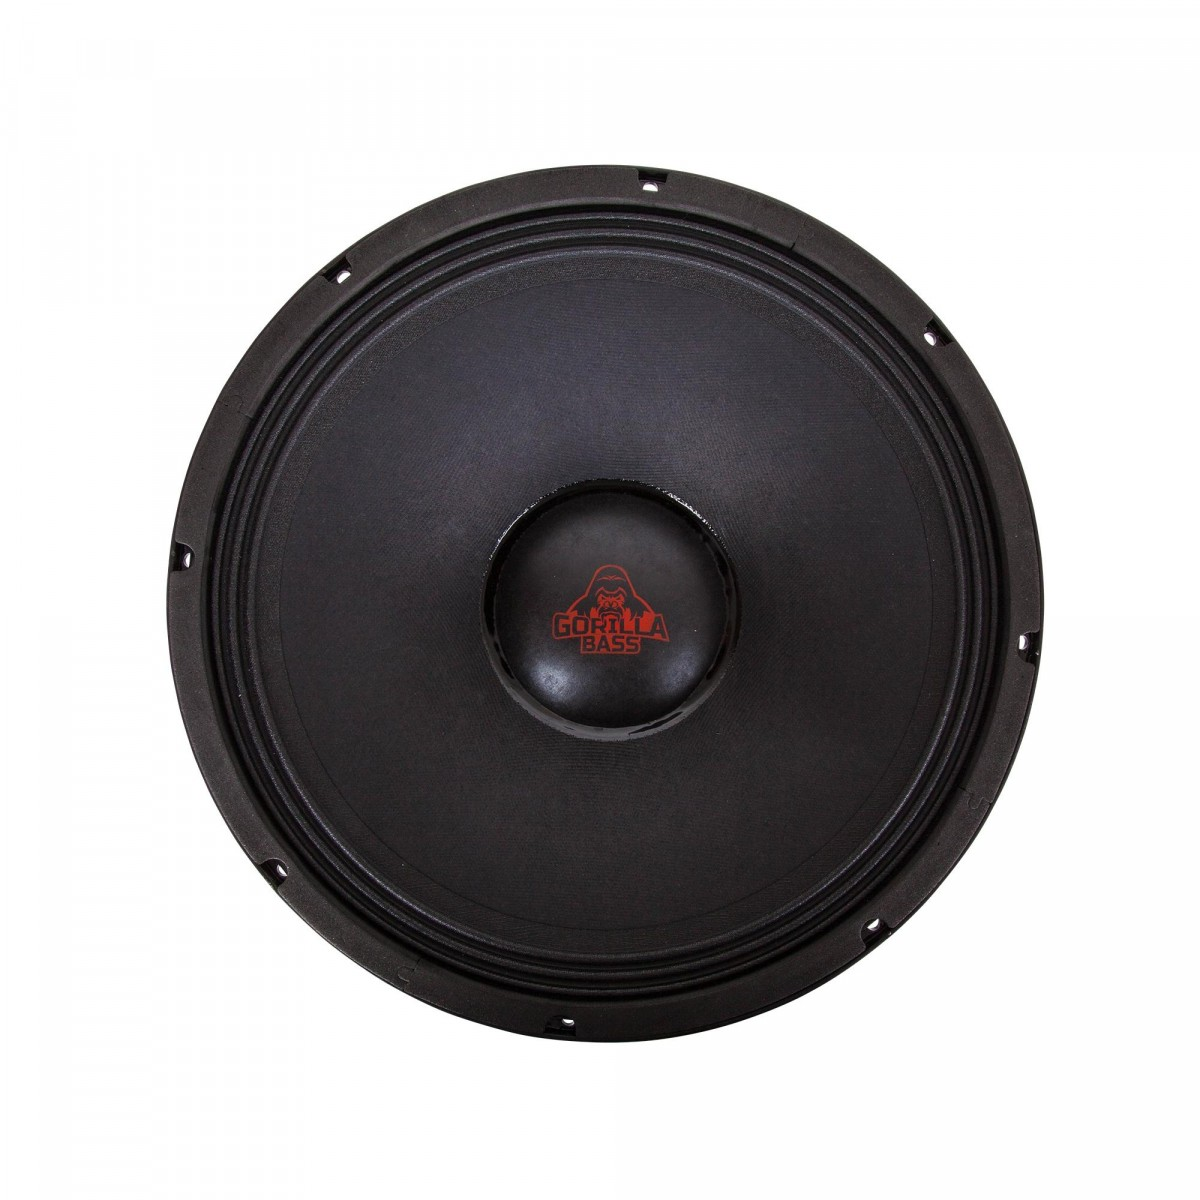 Сабвуфер Kicx Gorilla Bass GB15M